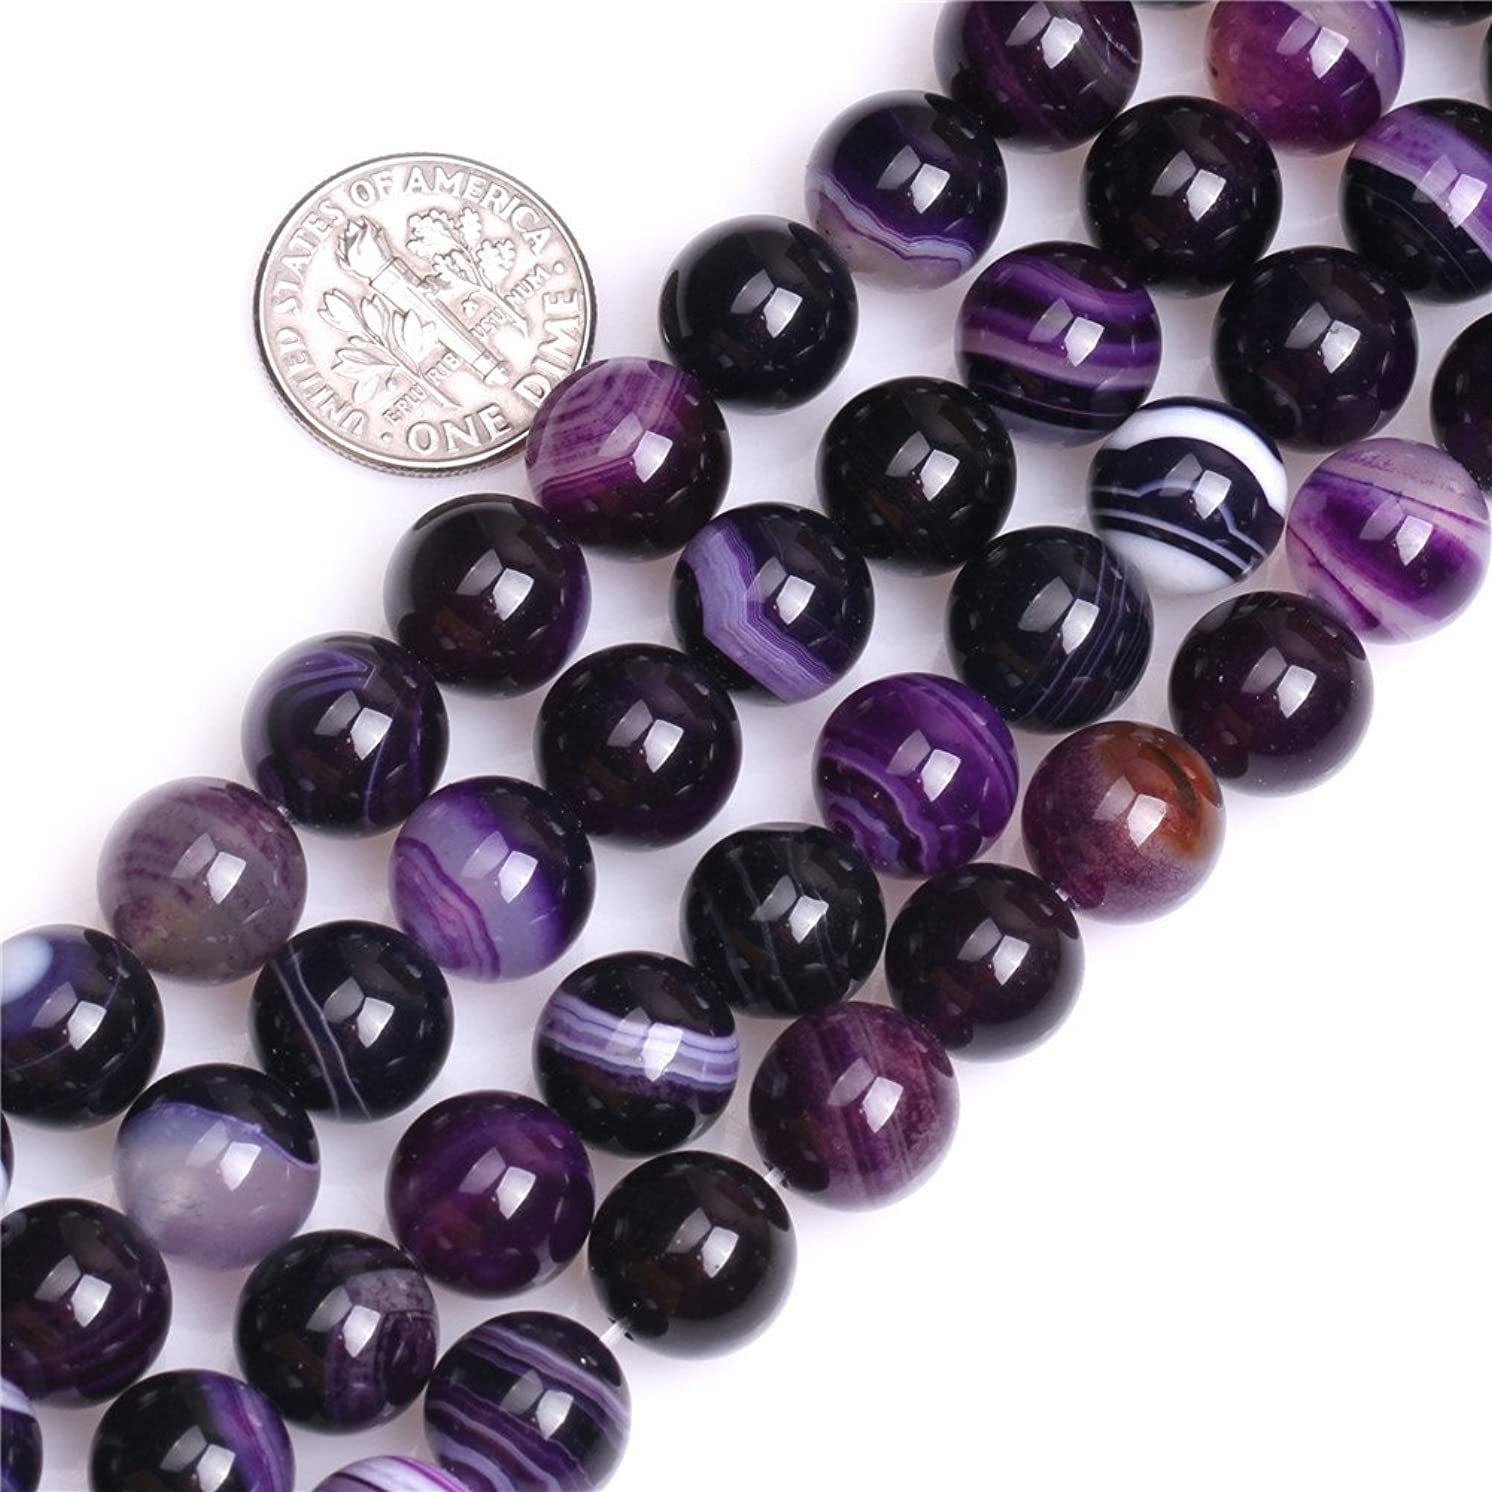 Stripe Purple Agate Beads for Jewelry Making Gemstone Semi Precious 10mm Round 15